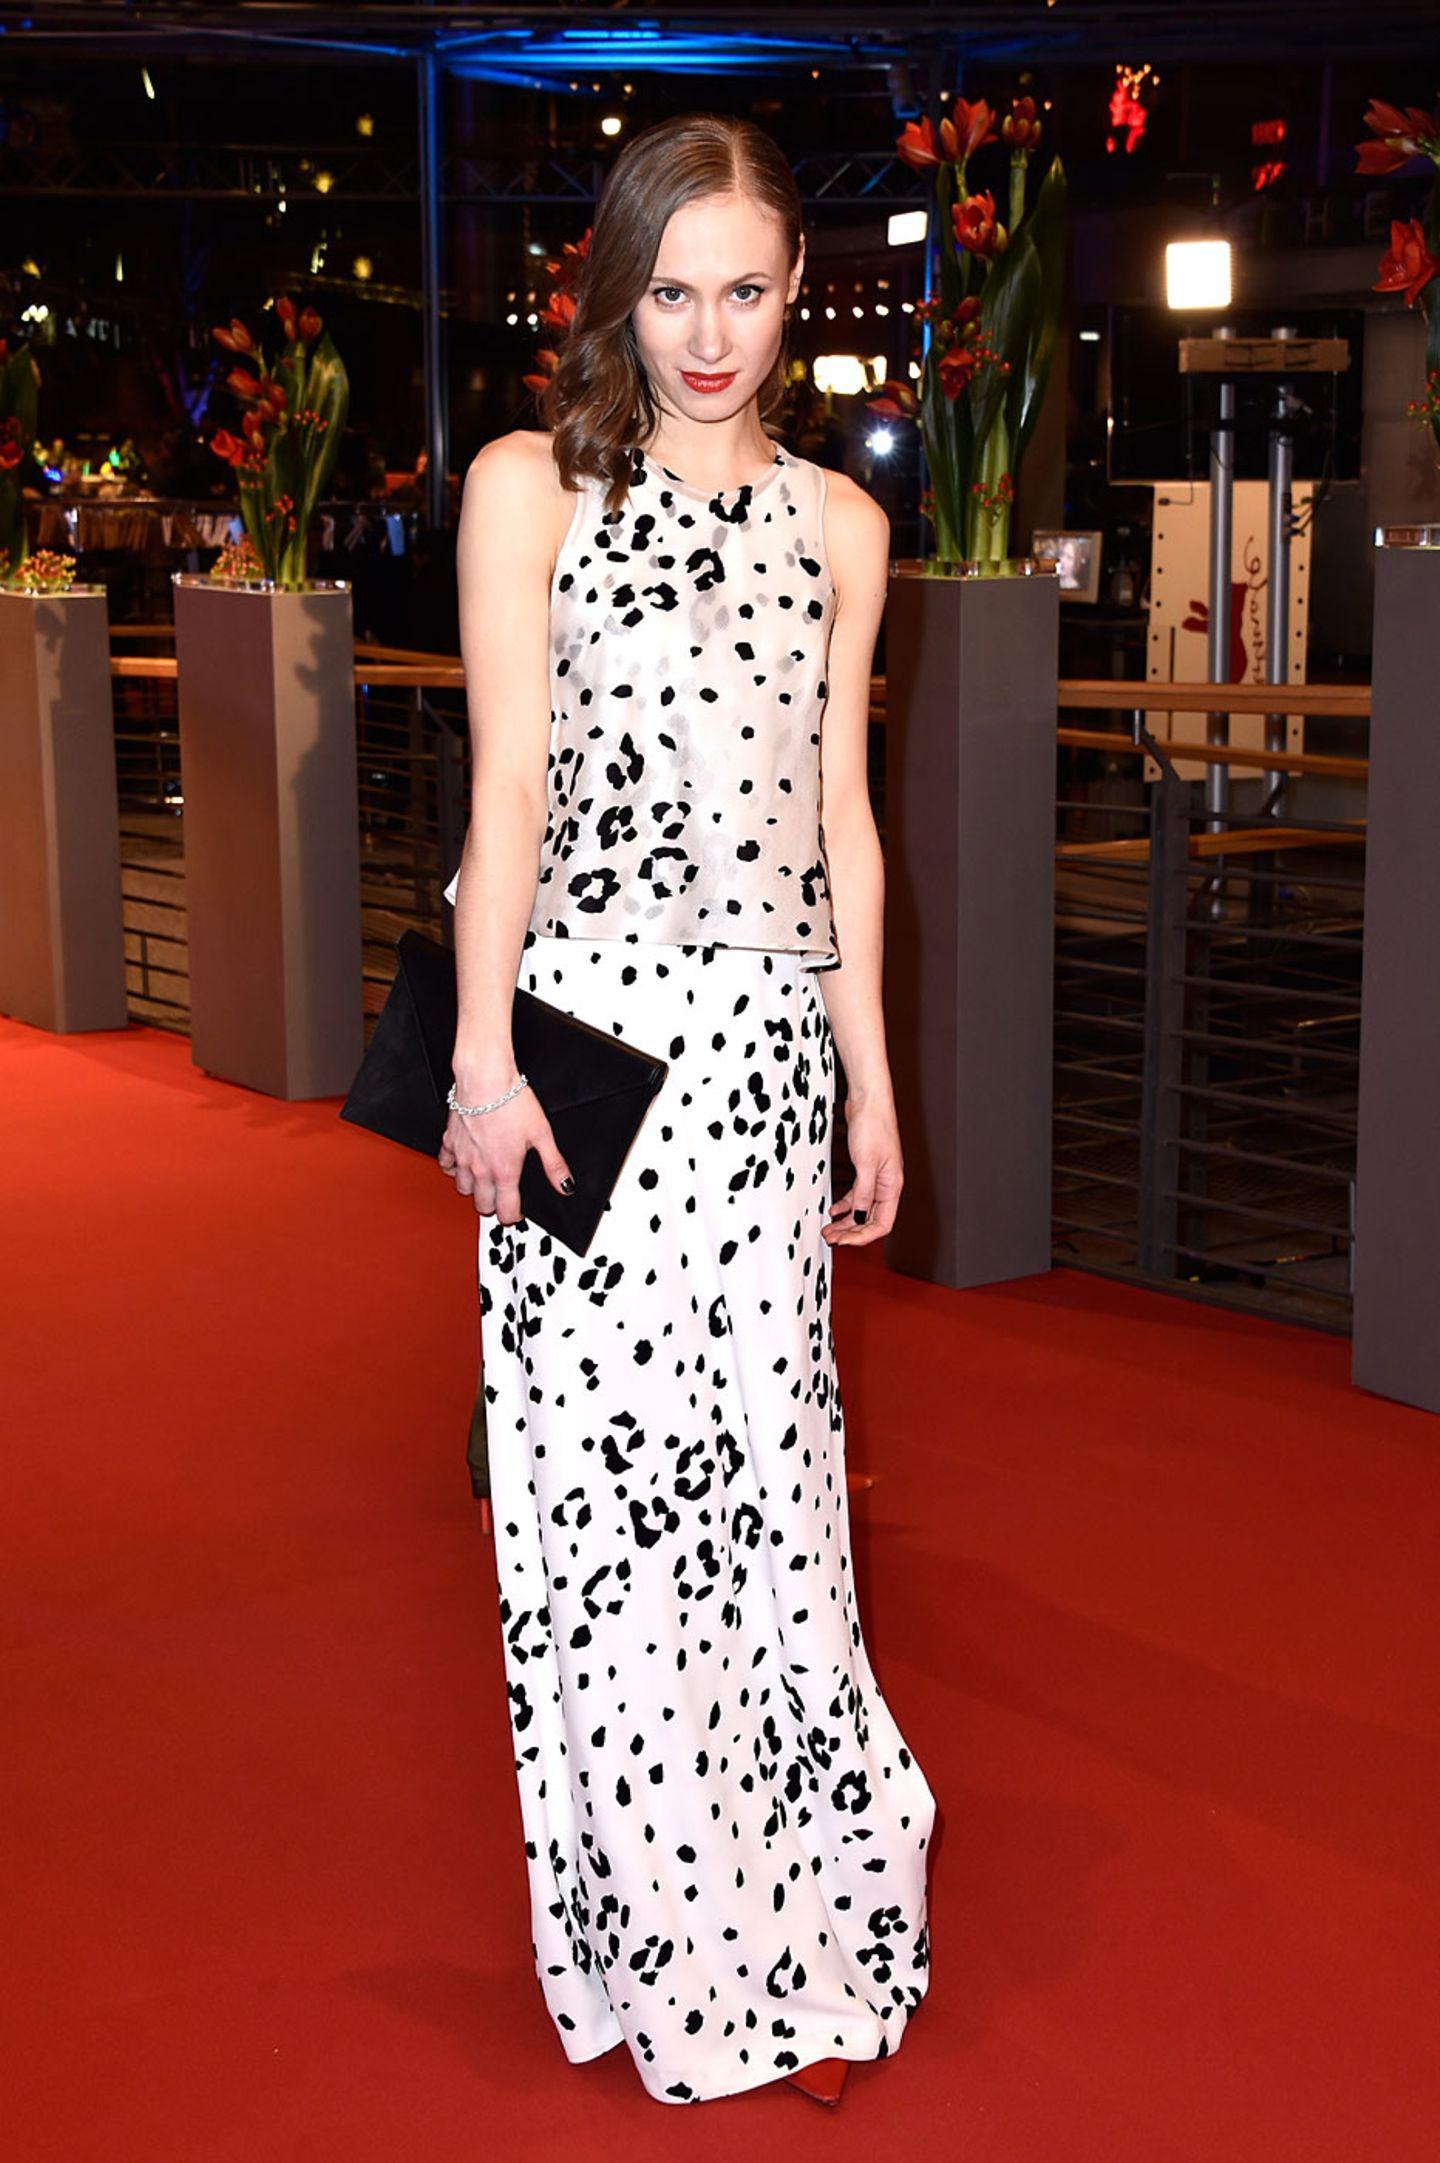 Berlinale 2016: Alina Levshin